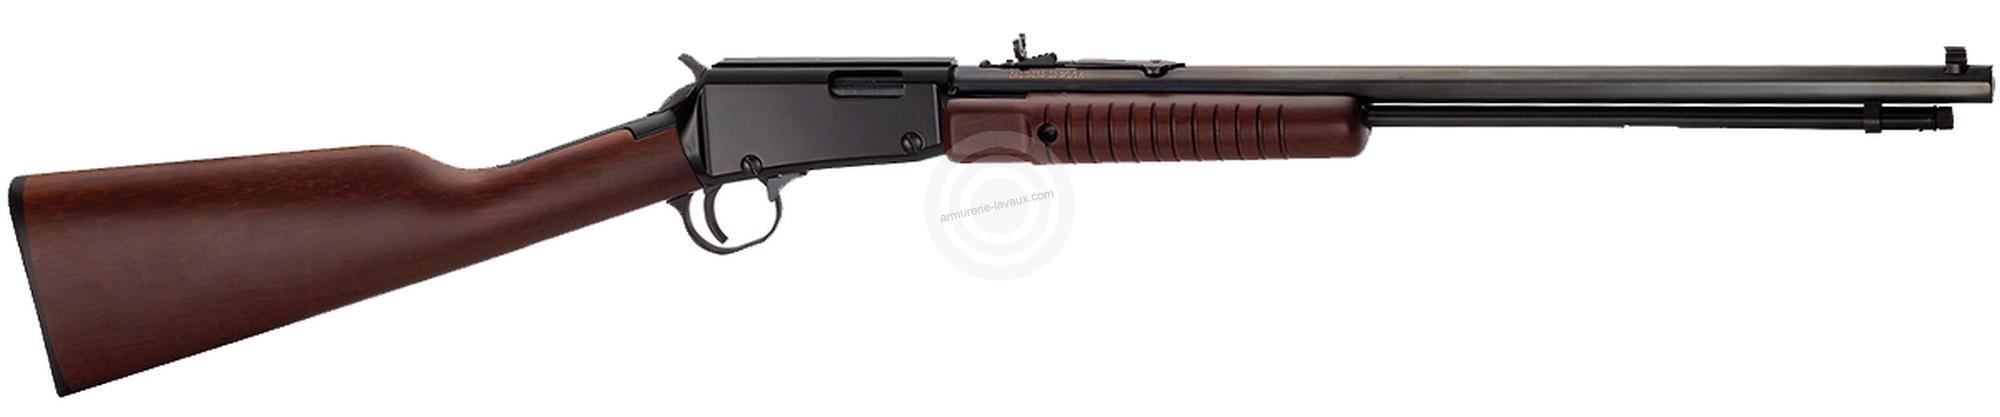 carabine 22 Lr HENRY Pump Action